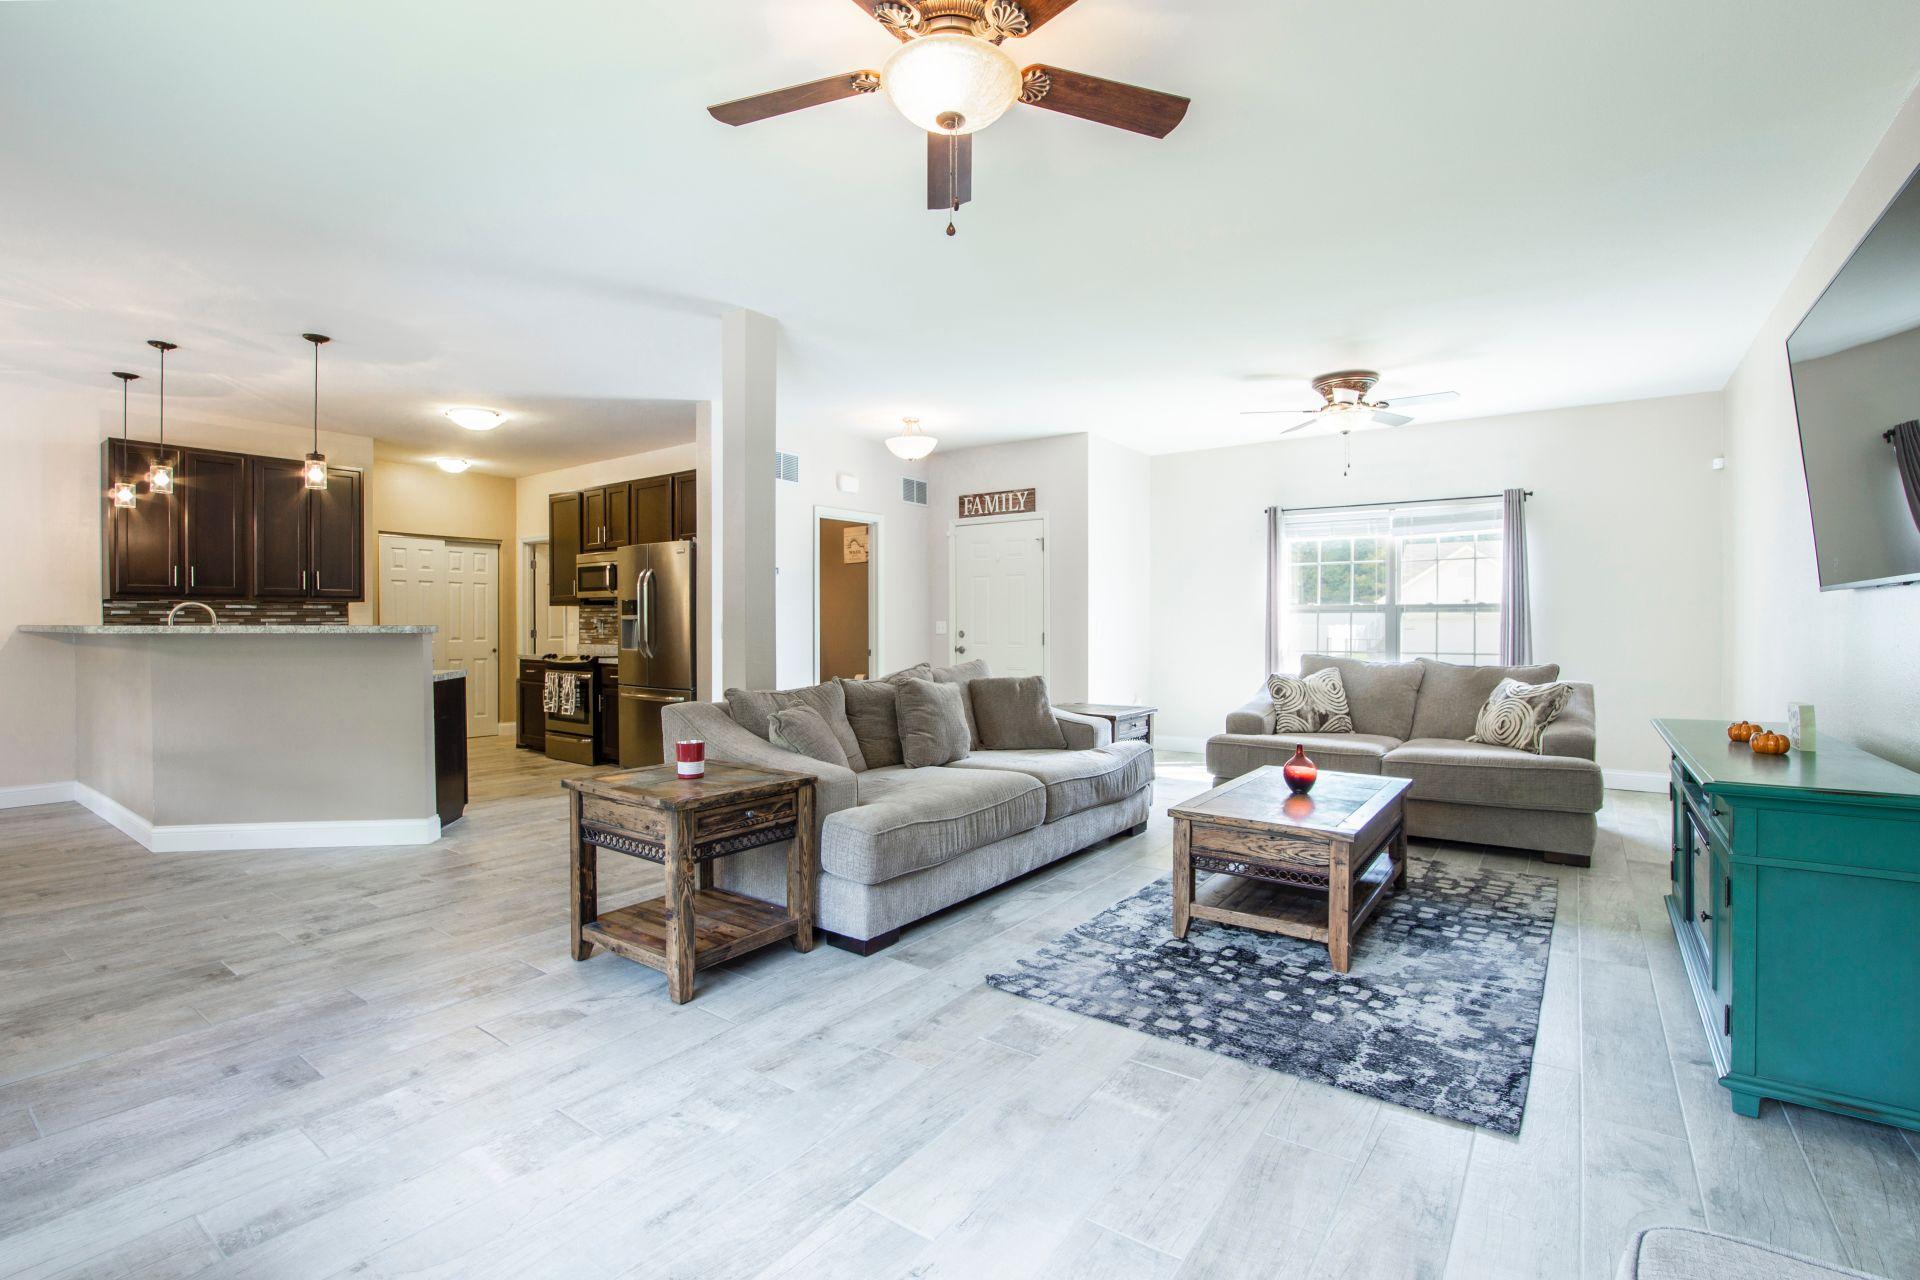 Windwood Condos For Sale in Boca Raton